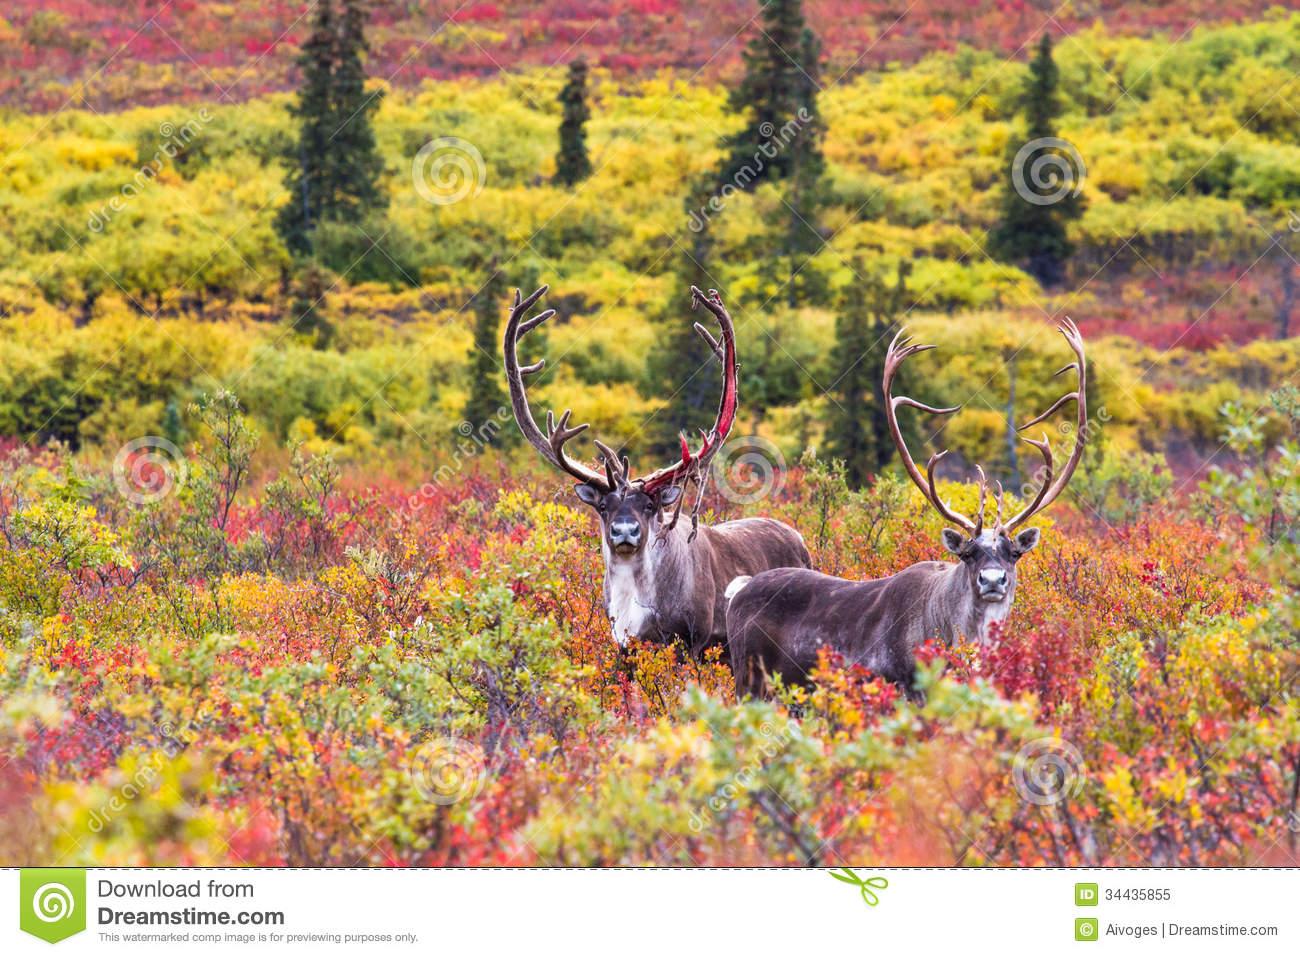 Denali National Park clipart #11, Download drawings